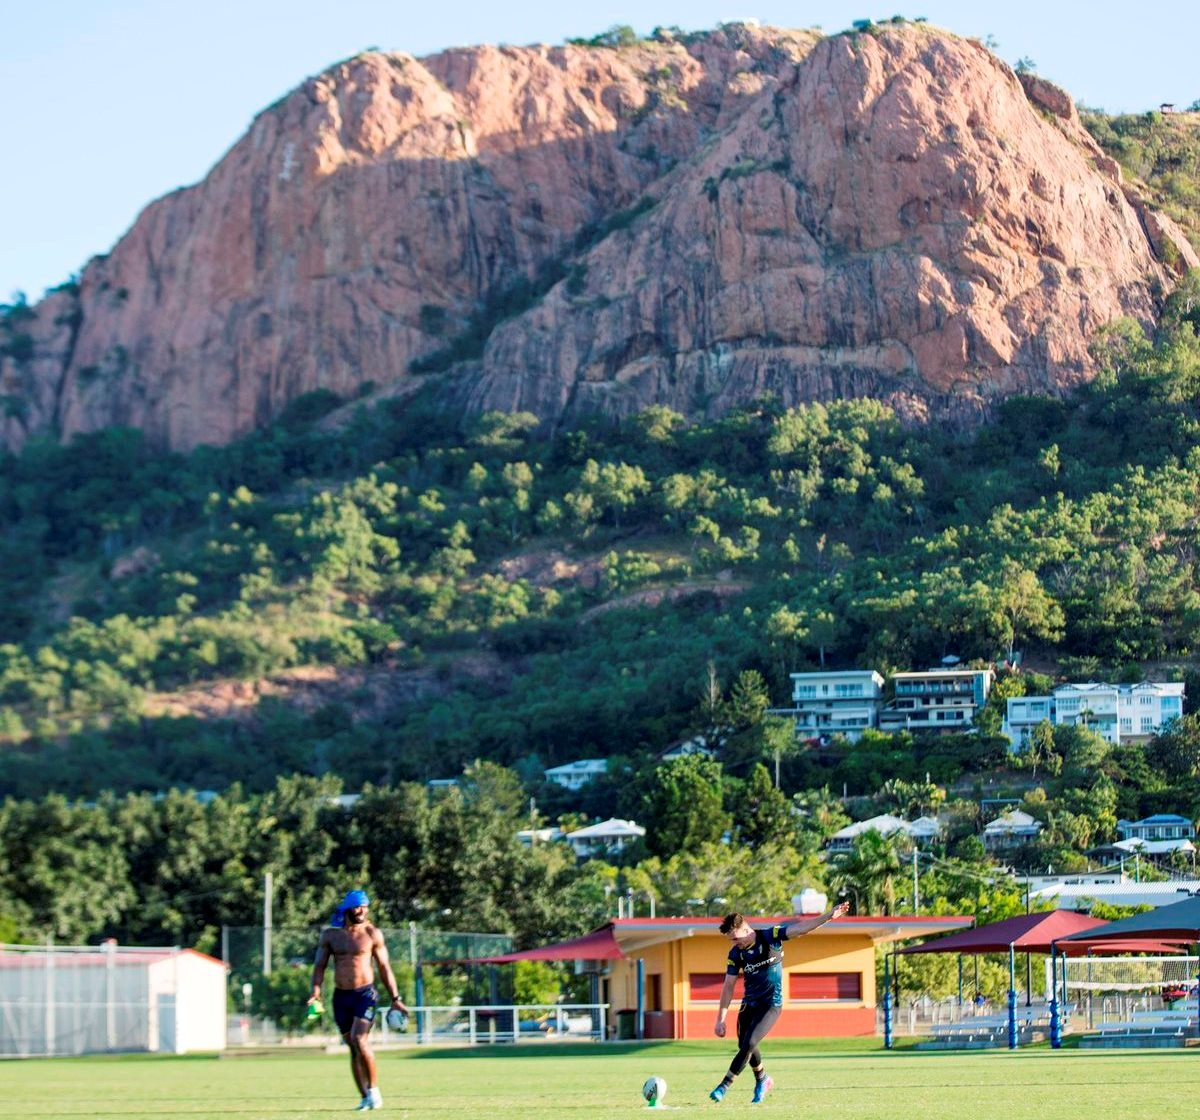 Townsville practice